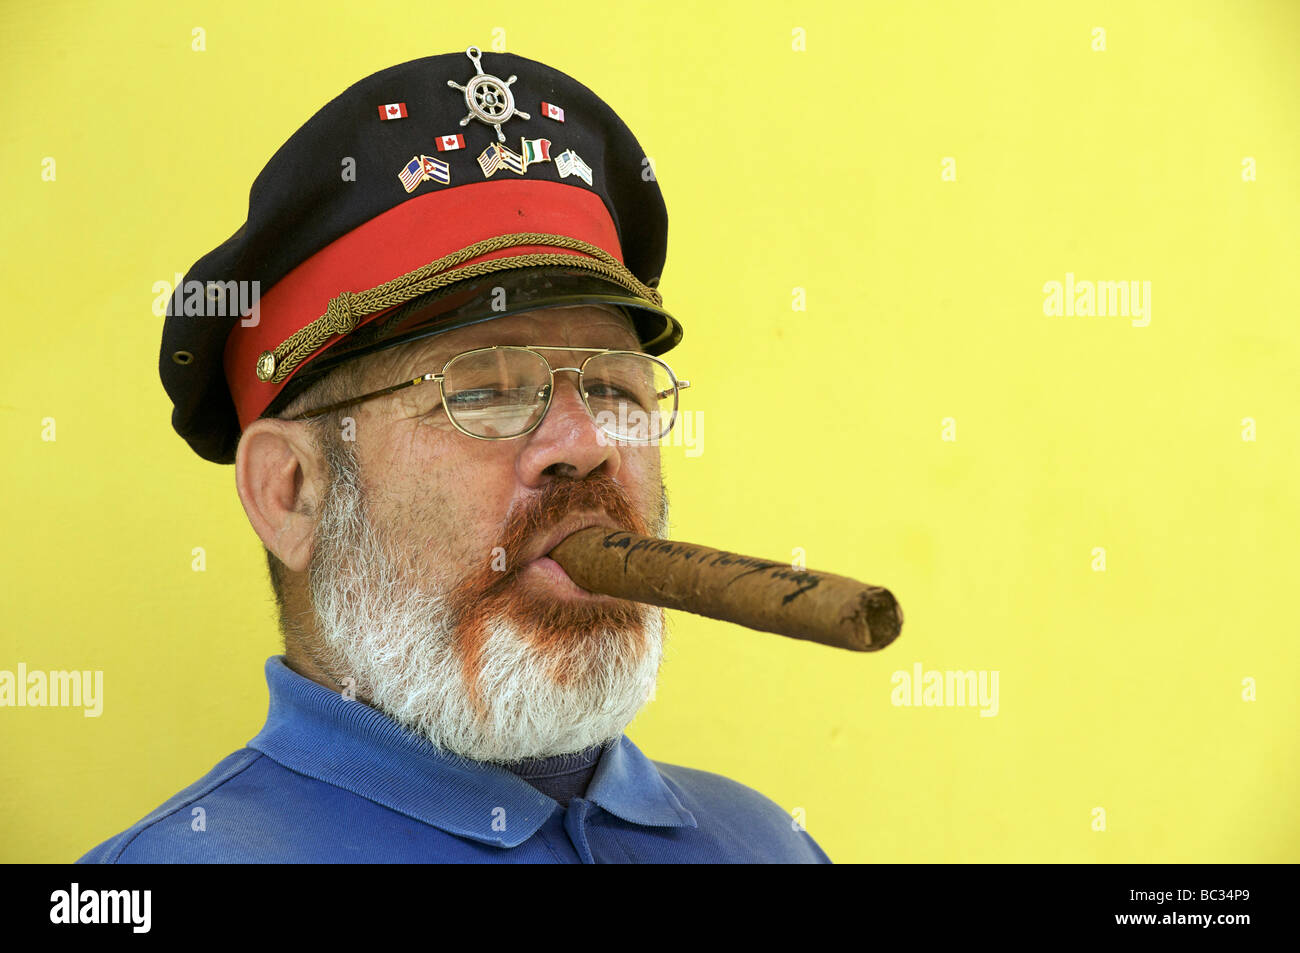 Man Cigar Havana Cuba Stock Photos & Man Cigar Havana Cuba Stock ...